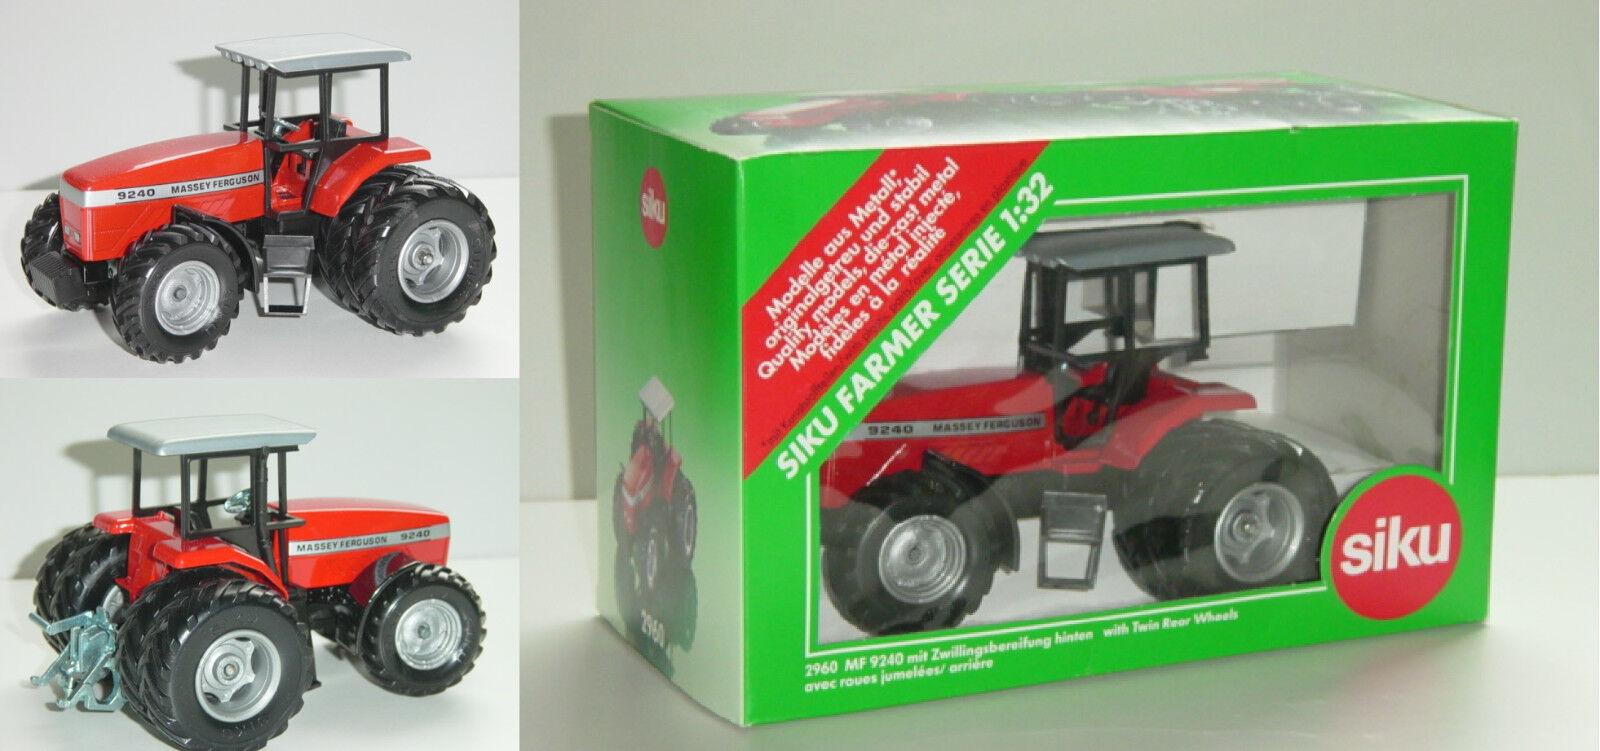 Siku Farmer Farmer Farmer 2960 Massey Ferguson 9240 Traktor mit Zwillingsbereifung, 1 32 c7b456